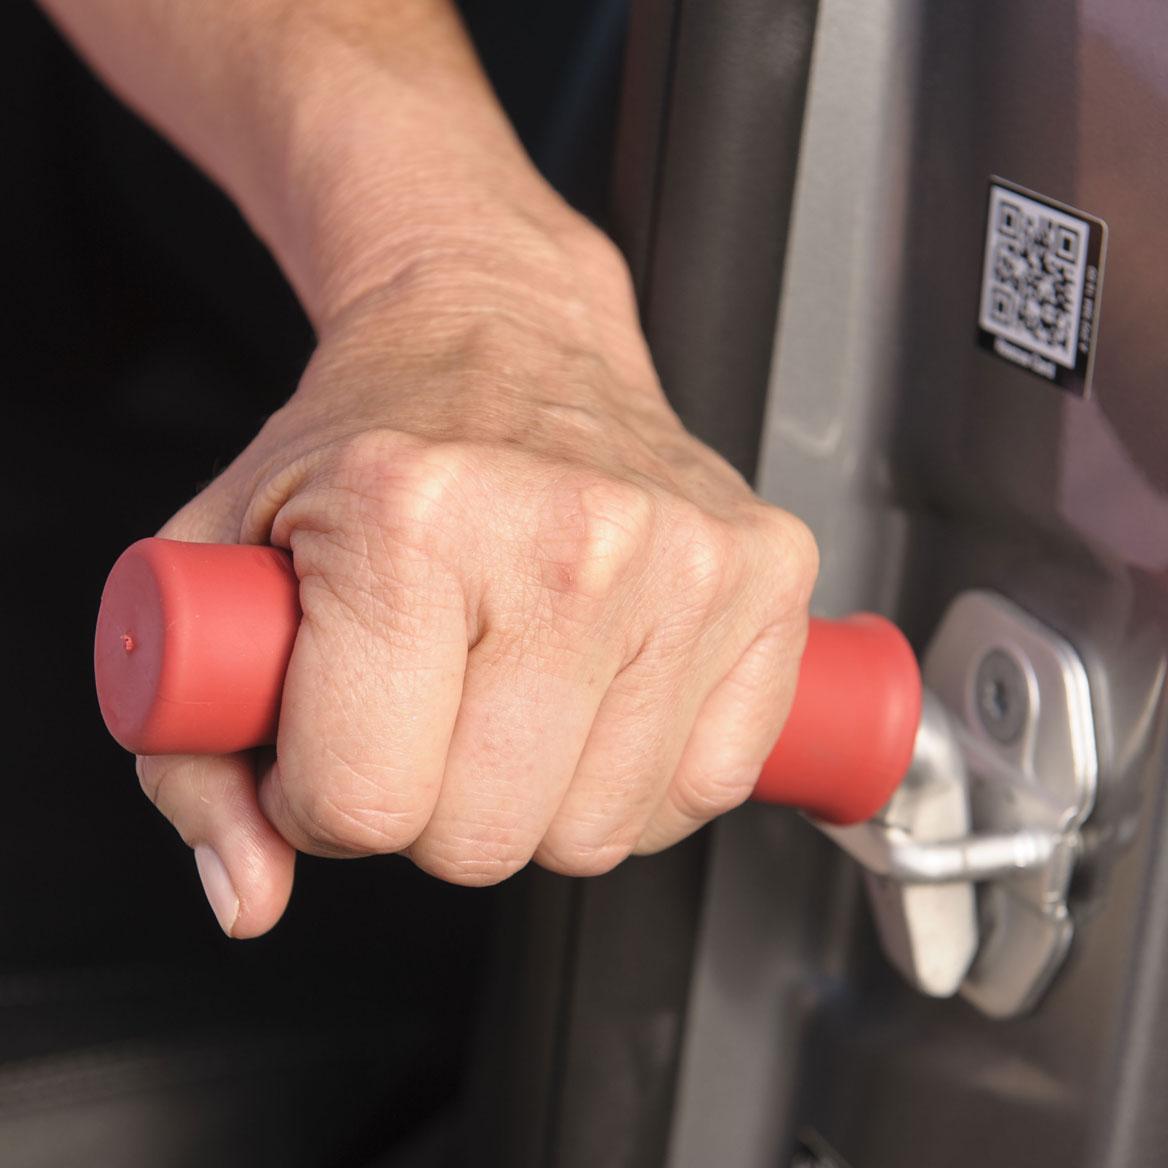 Auto Helper Cane-359508